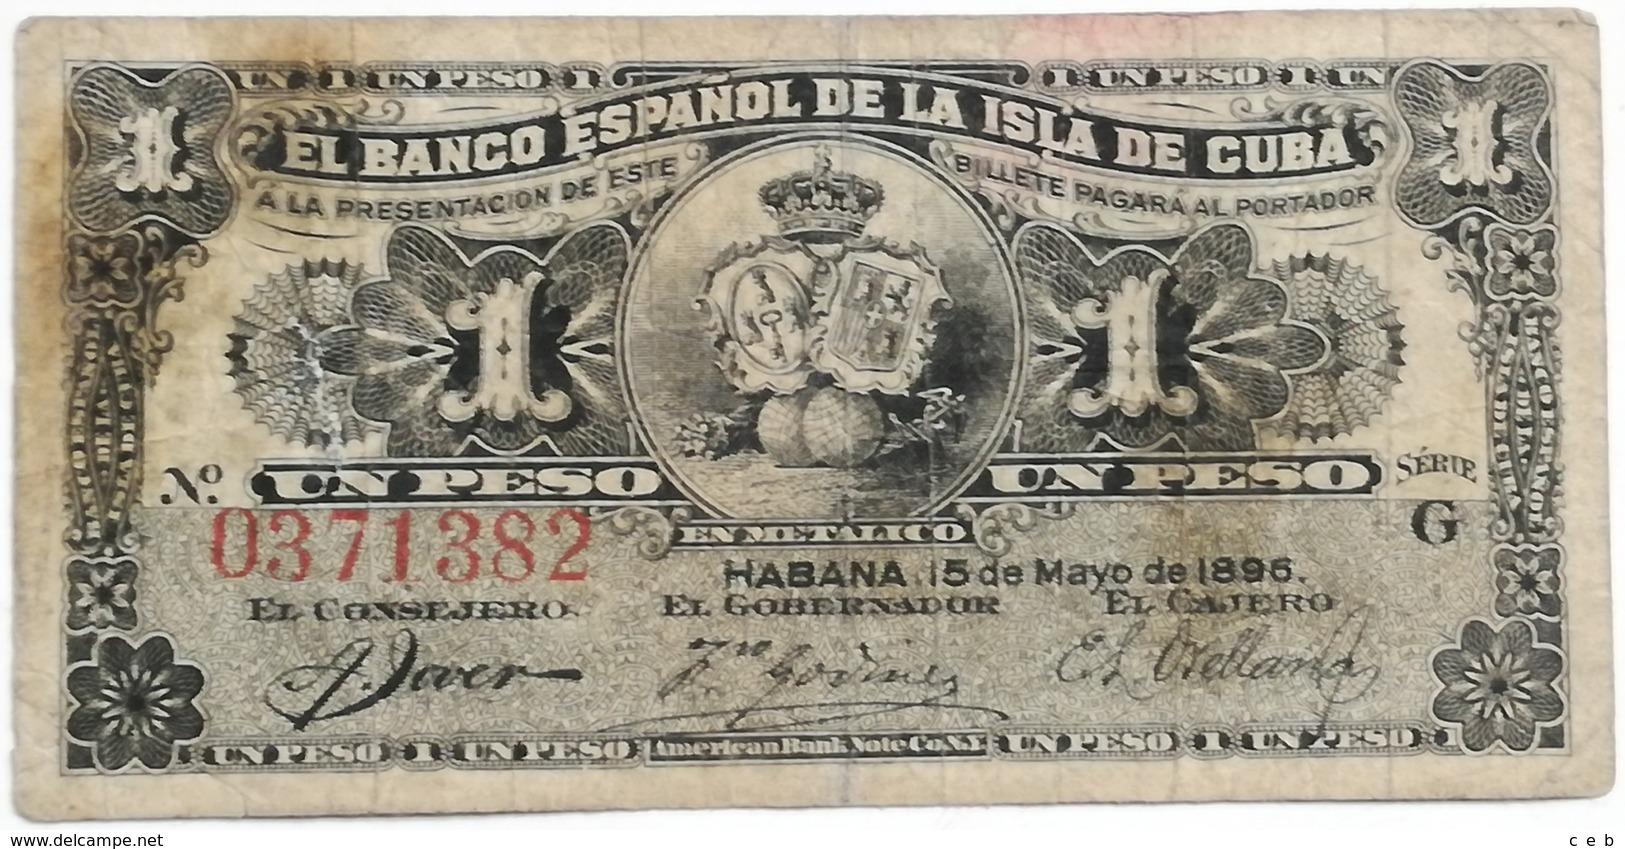 Billete Cuba Española. 1 Peso. 1896. Rey Alfonso XII. La Habana. Serie G - Cuba